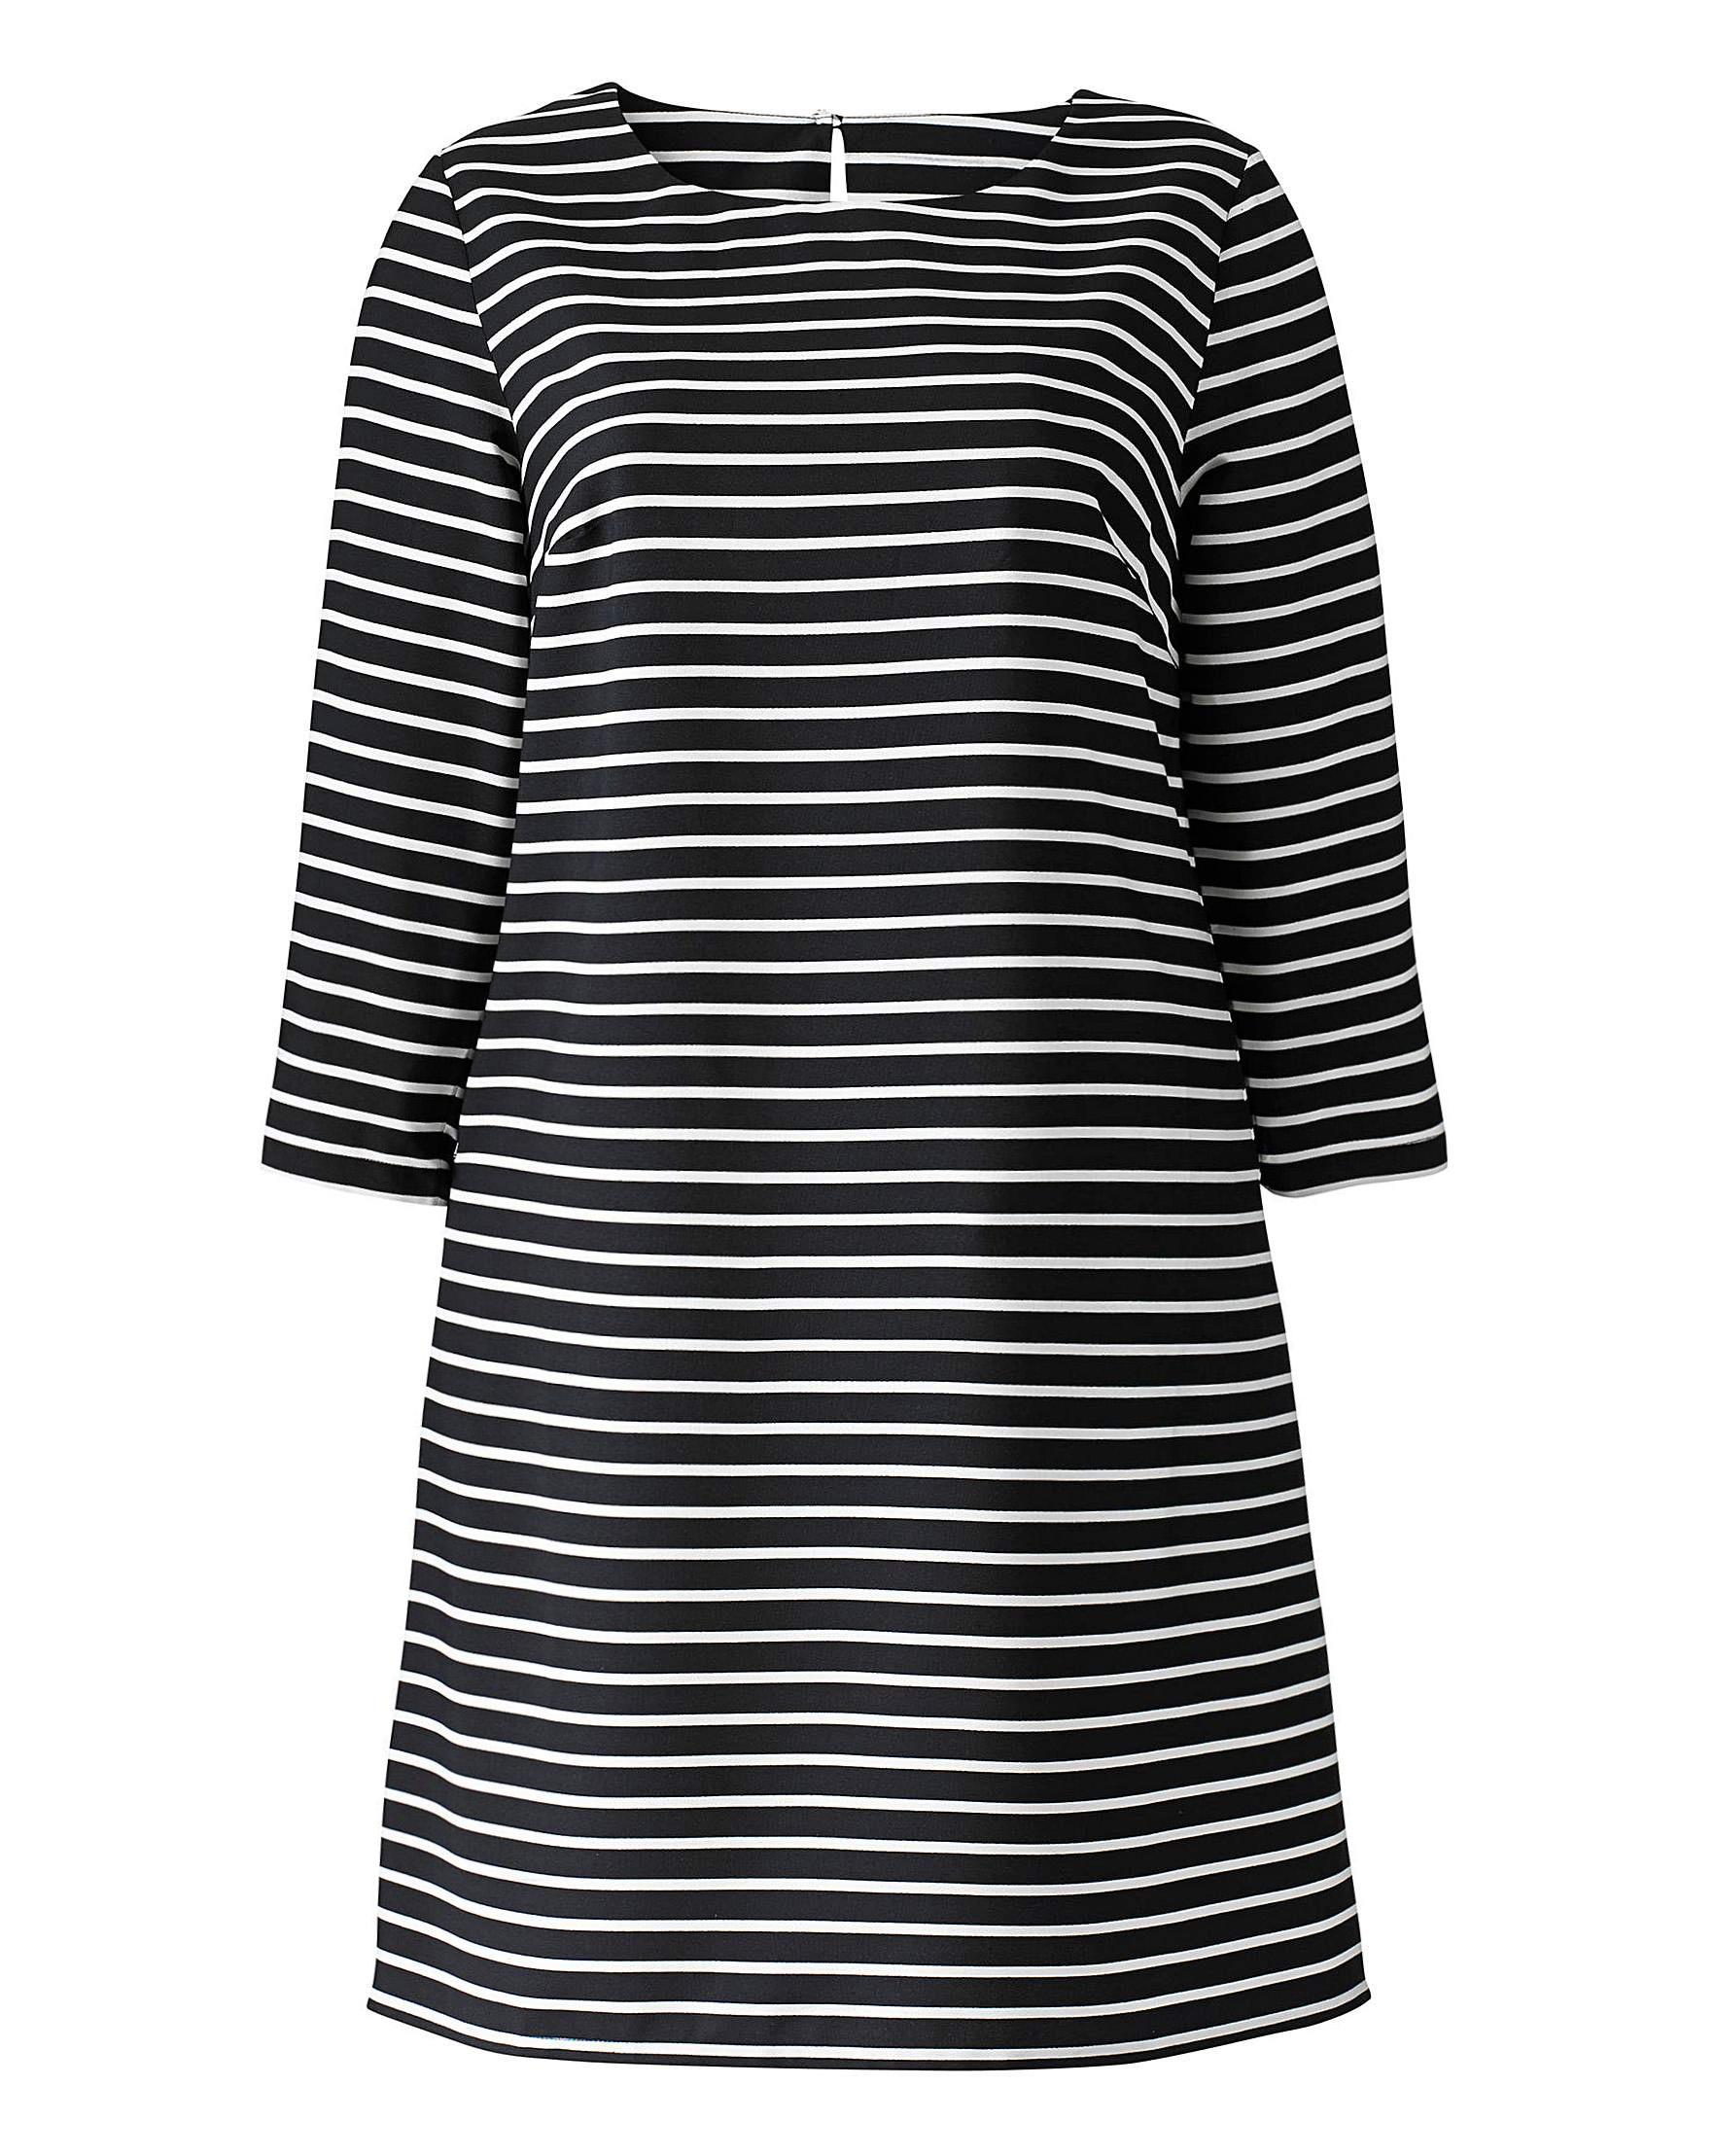 b33e7fb52dd Wholesale Plus Size Clothing from Marisota - - Anthology MONO Striped Tunic  Dress - Plus Size 12 to 32